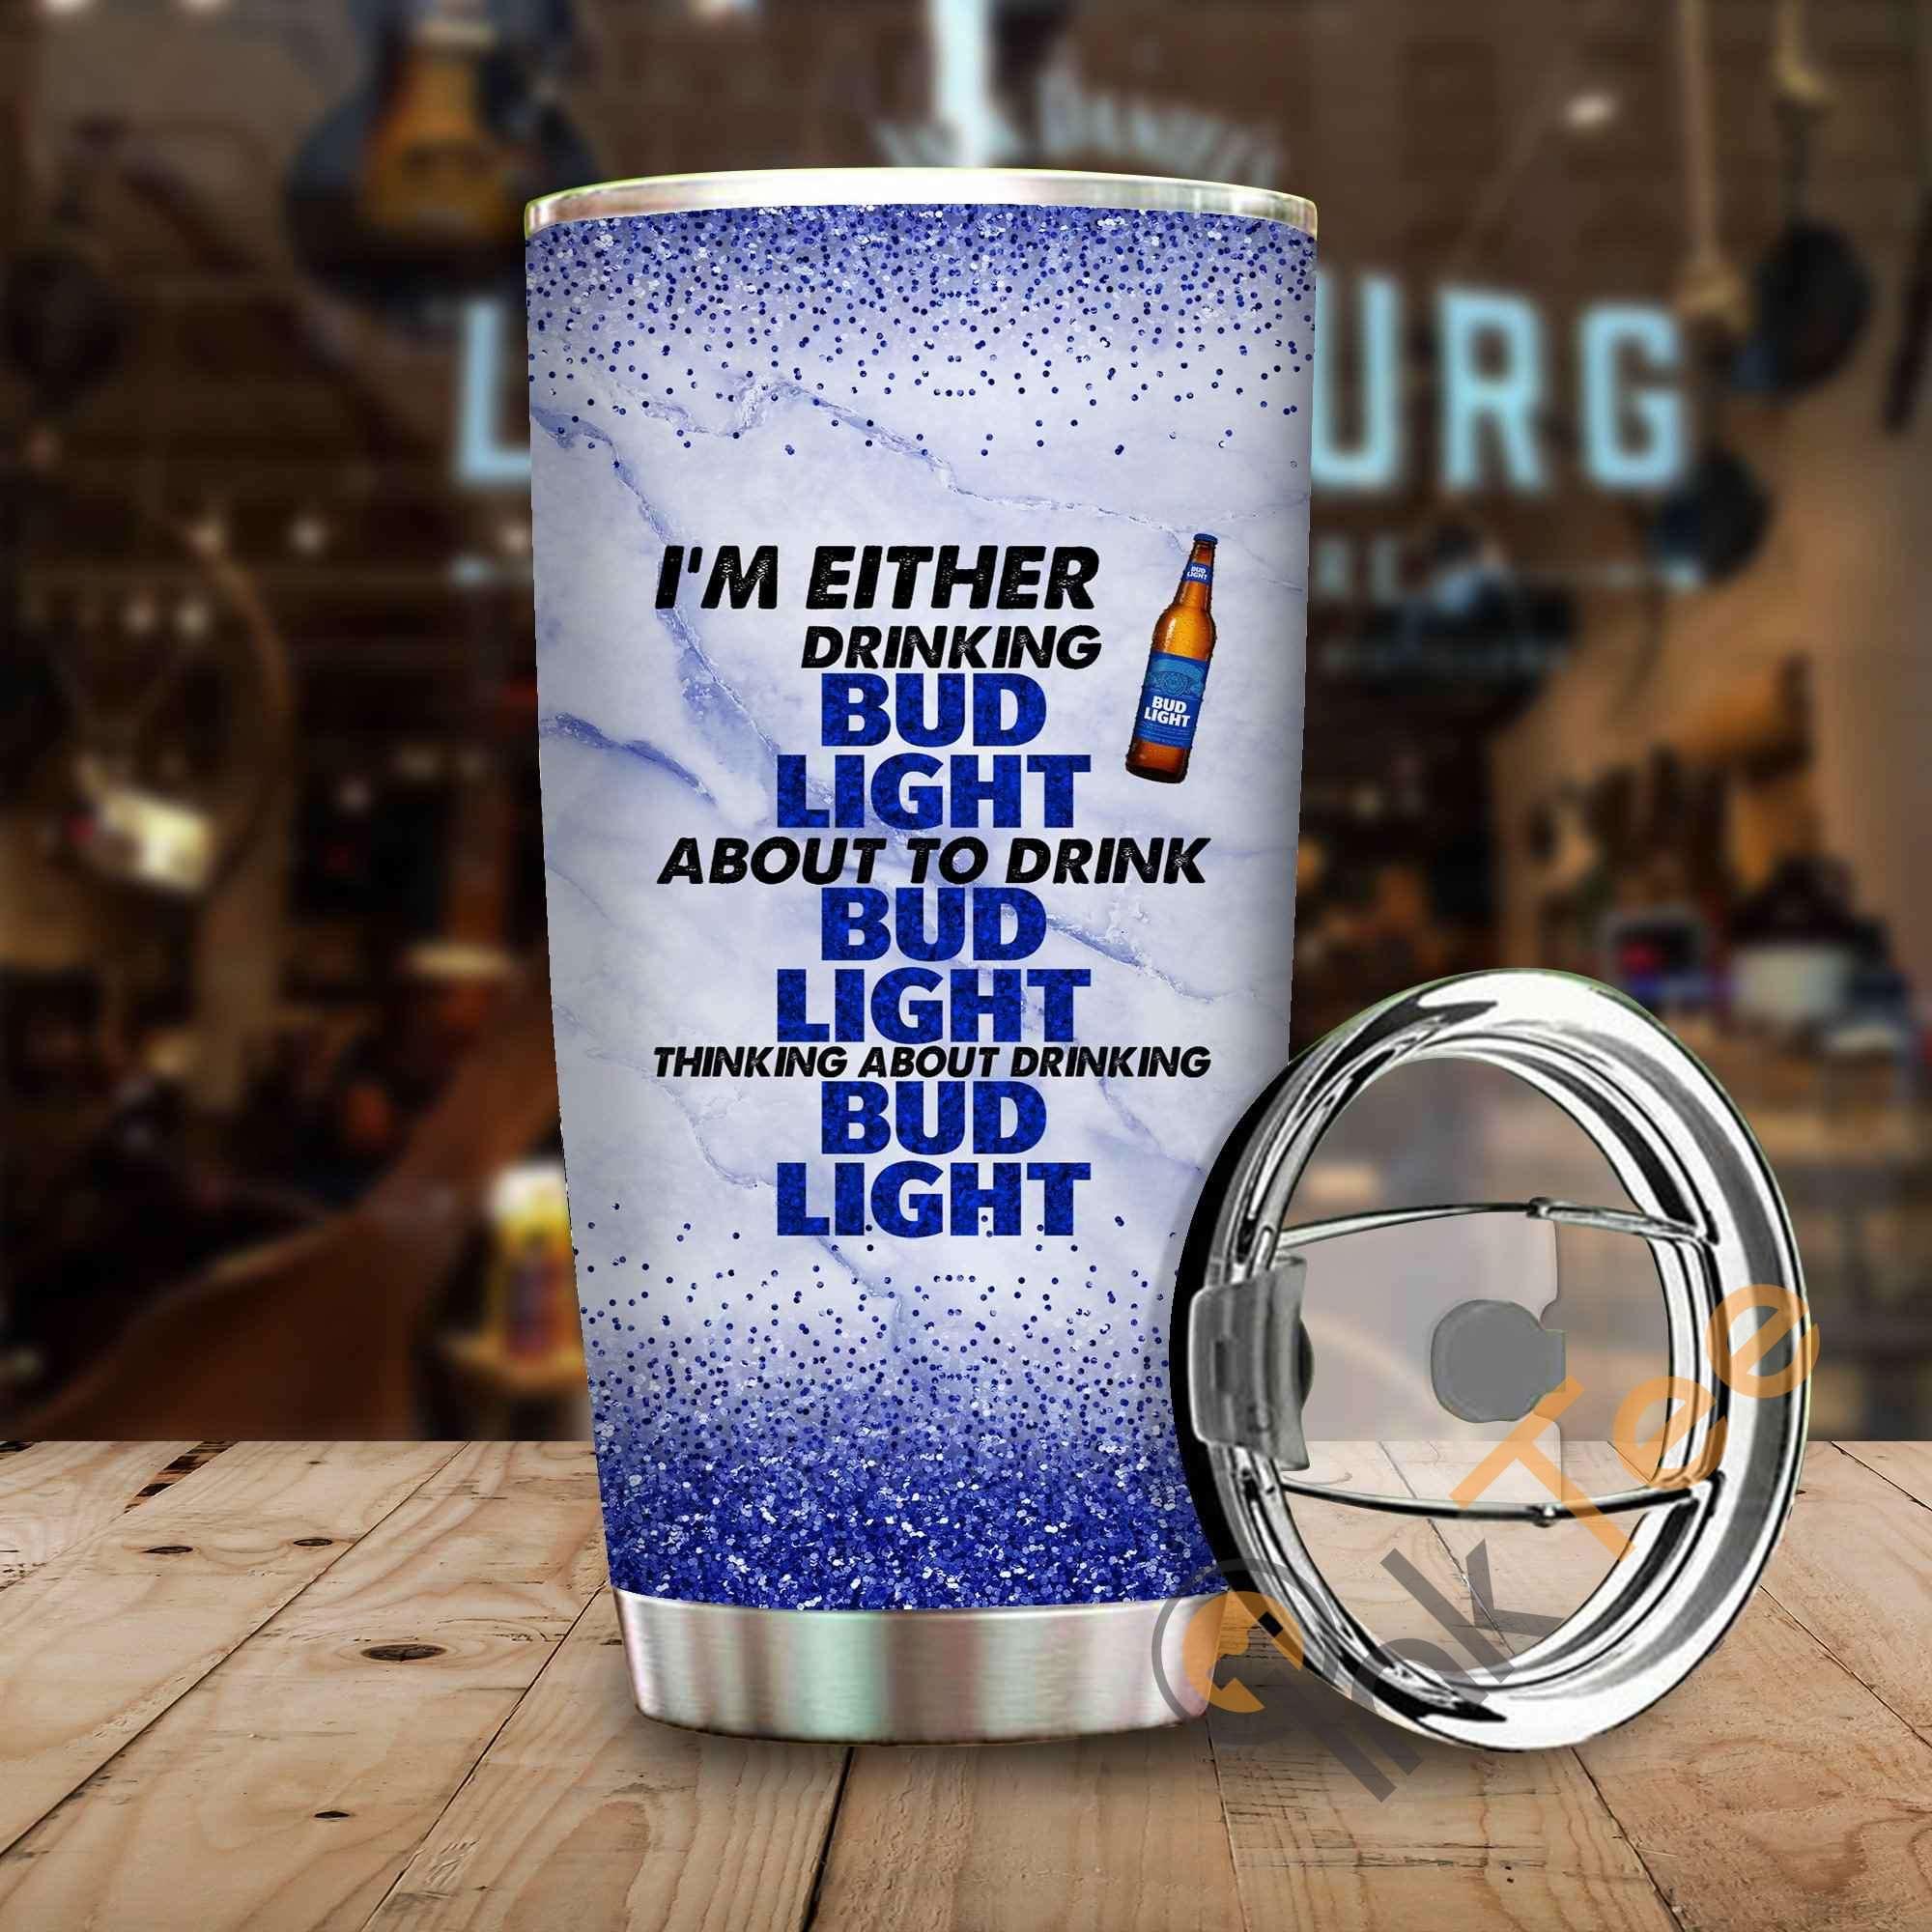 Im Either Drinking Bud Light Amazon Best Seller Sku 3966 Stainless Steel Tumbler